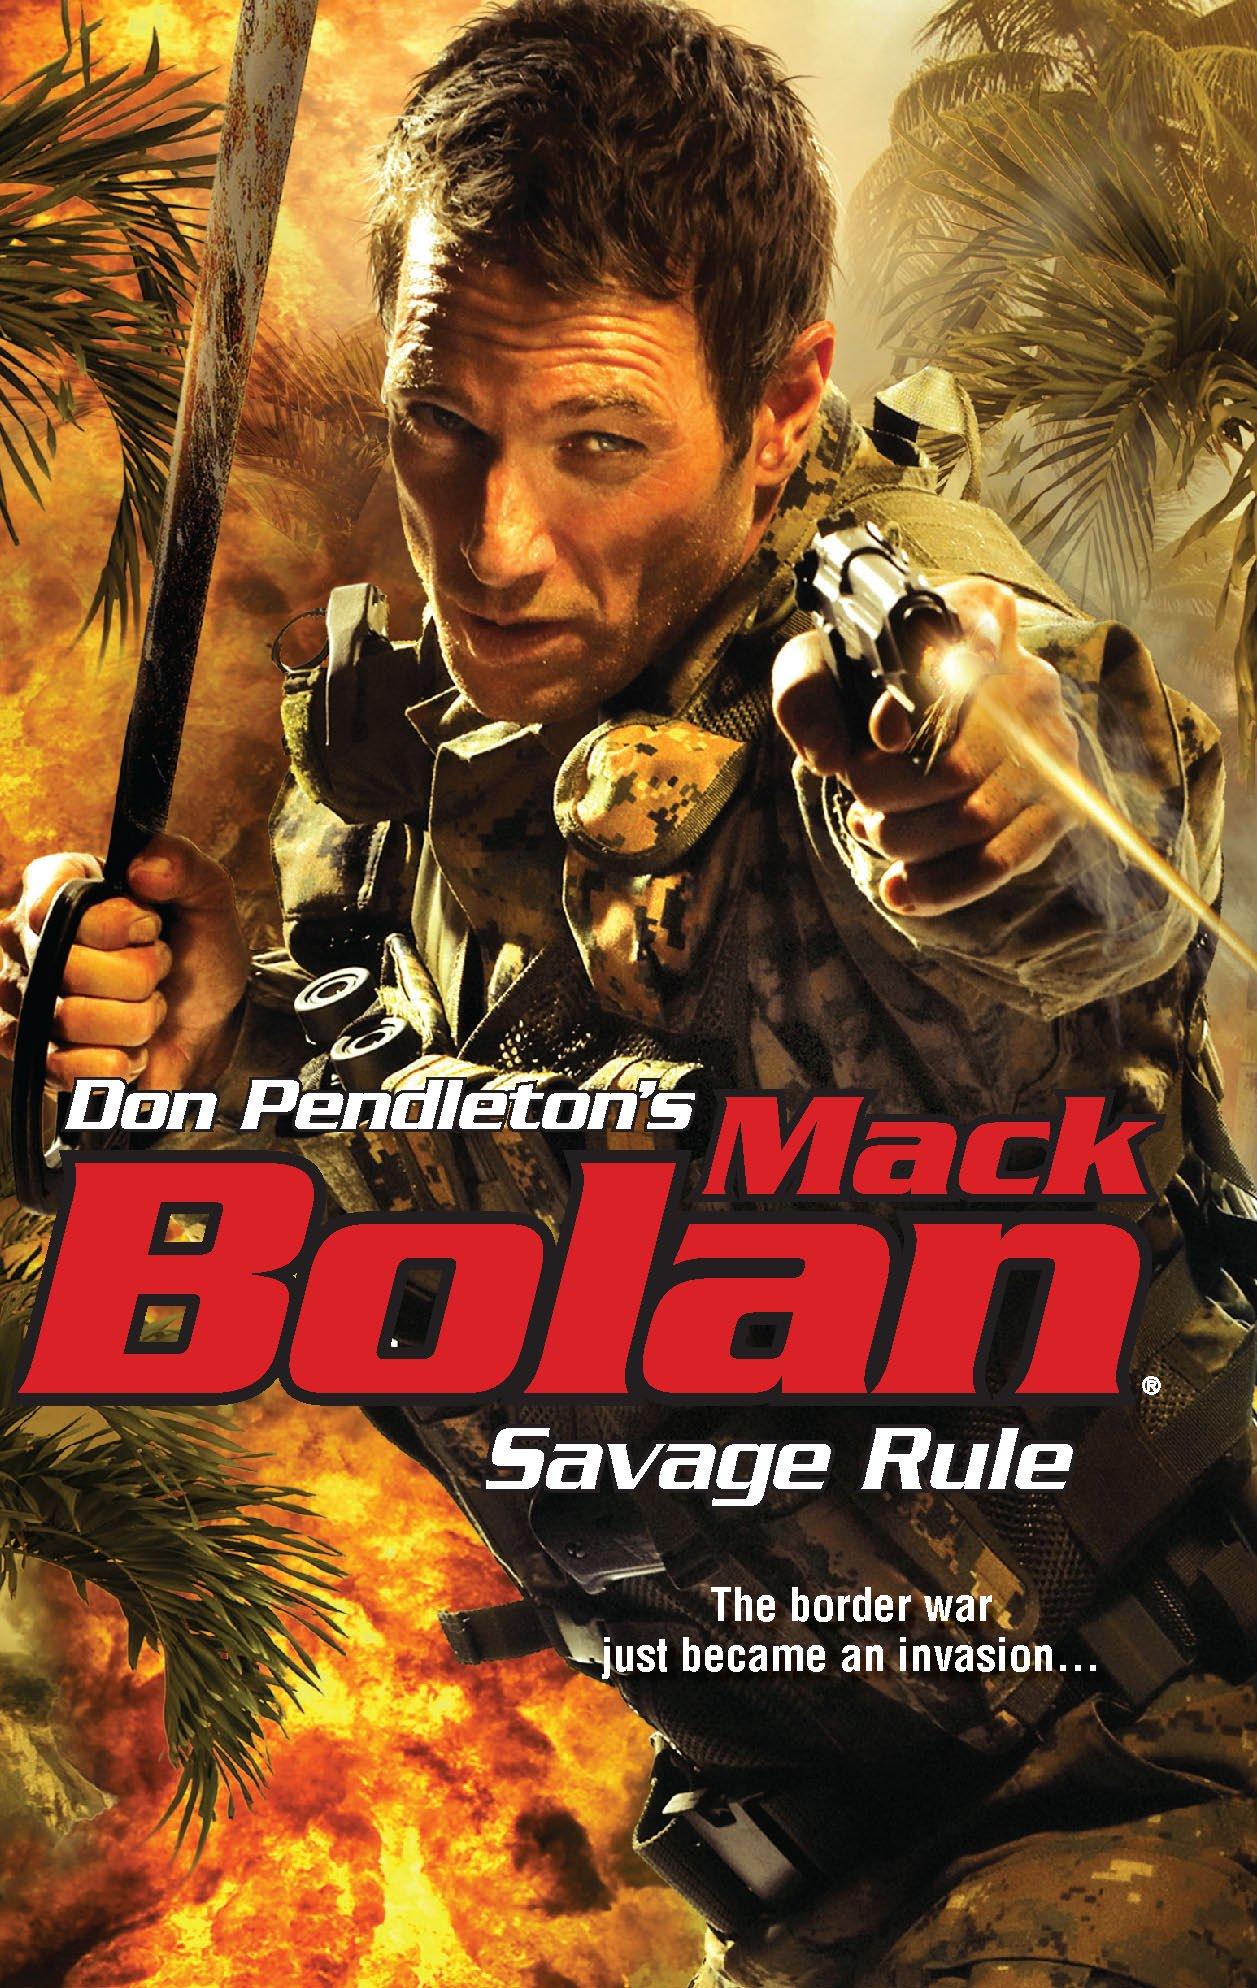 Amazon.com: Savage Rule (Mack Bolan) (9780373615421): Don Pendleton: Books